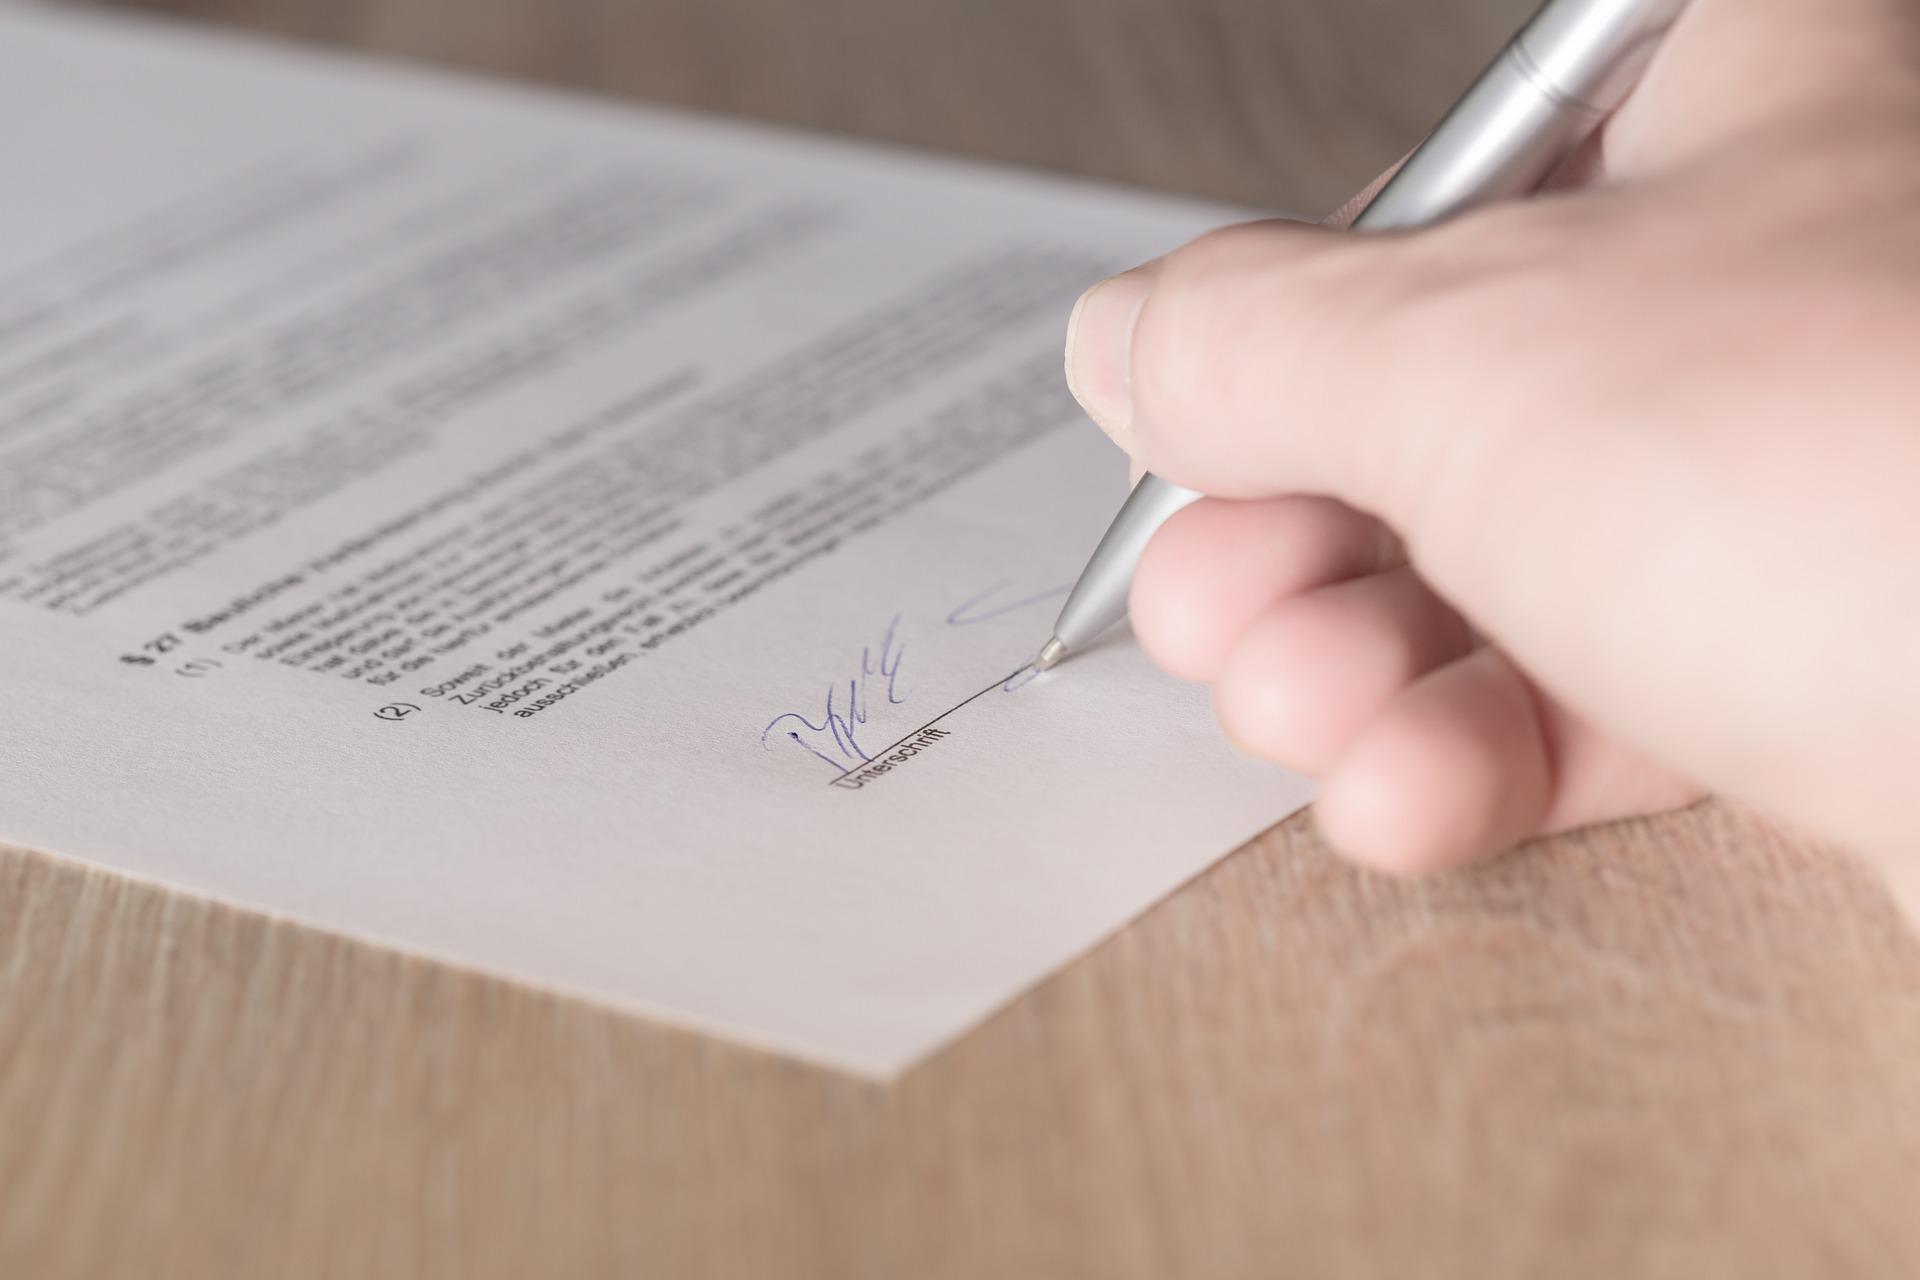 Improve Contract Management